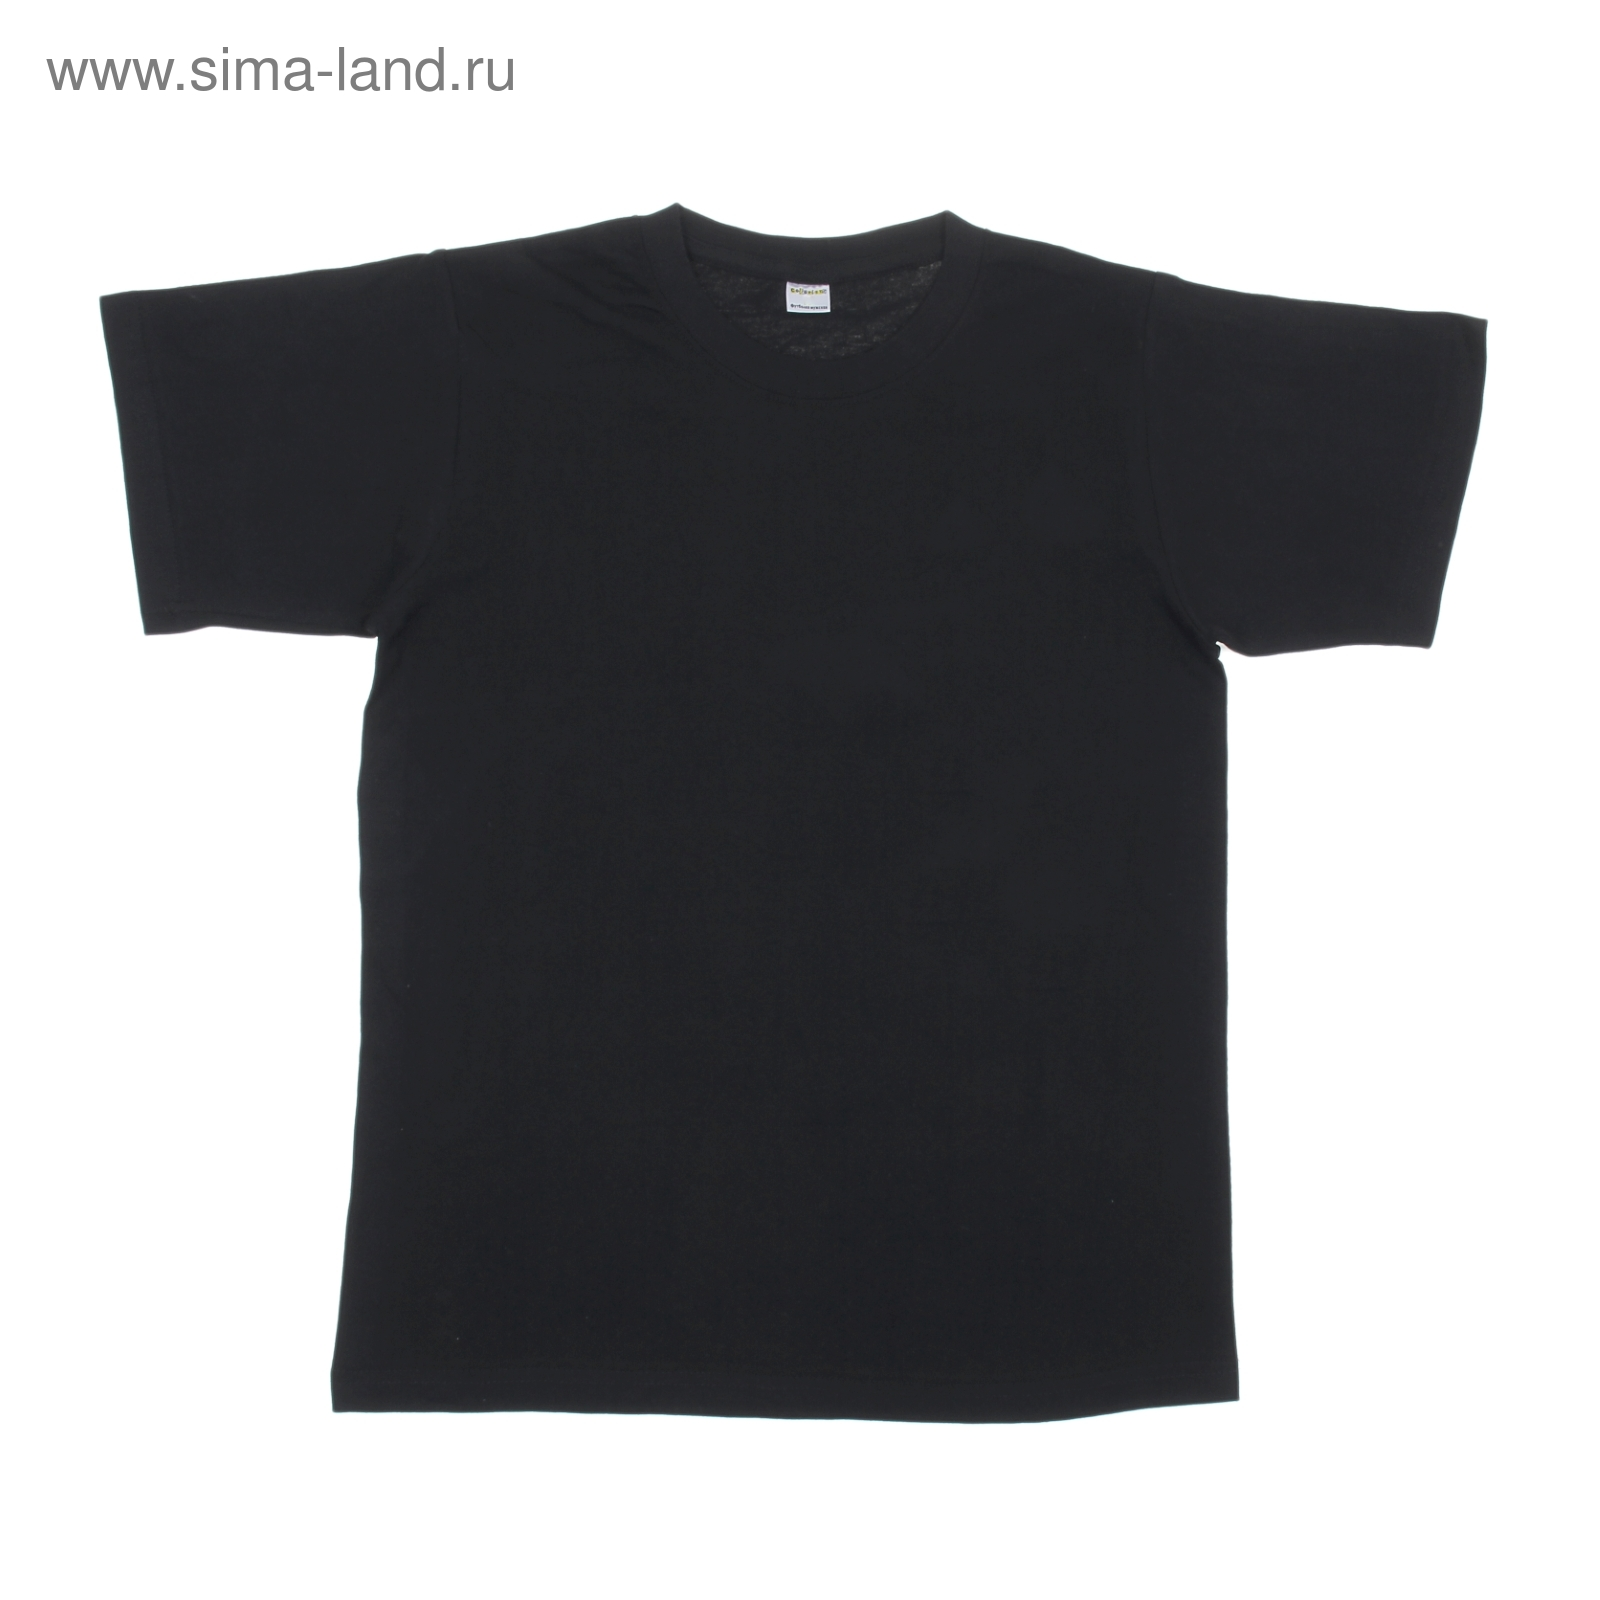 d4fc8fc7bb667 Футболка мужская чёрная Collorista, размер XL (50), 100% хлопок ...